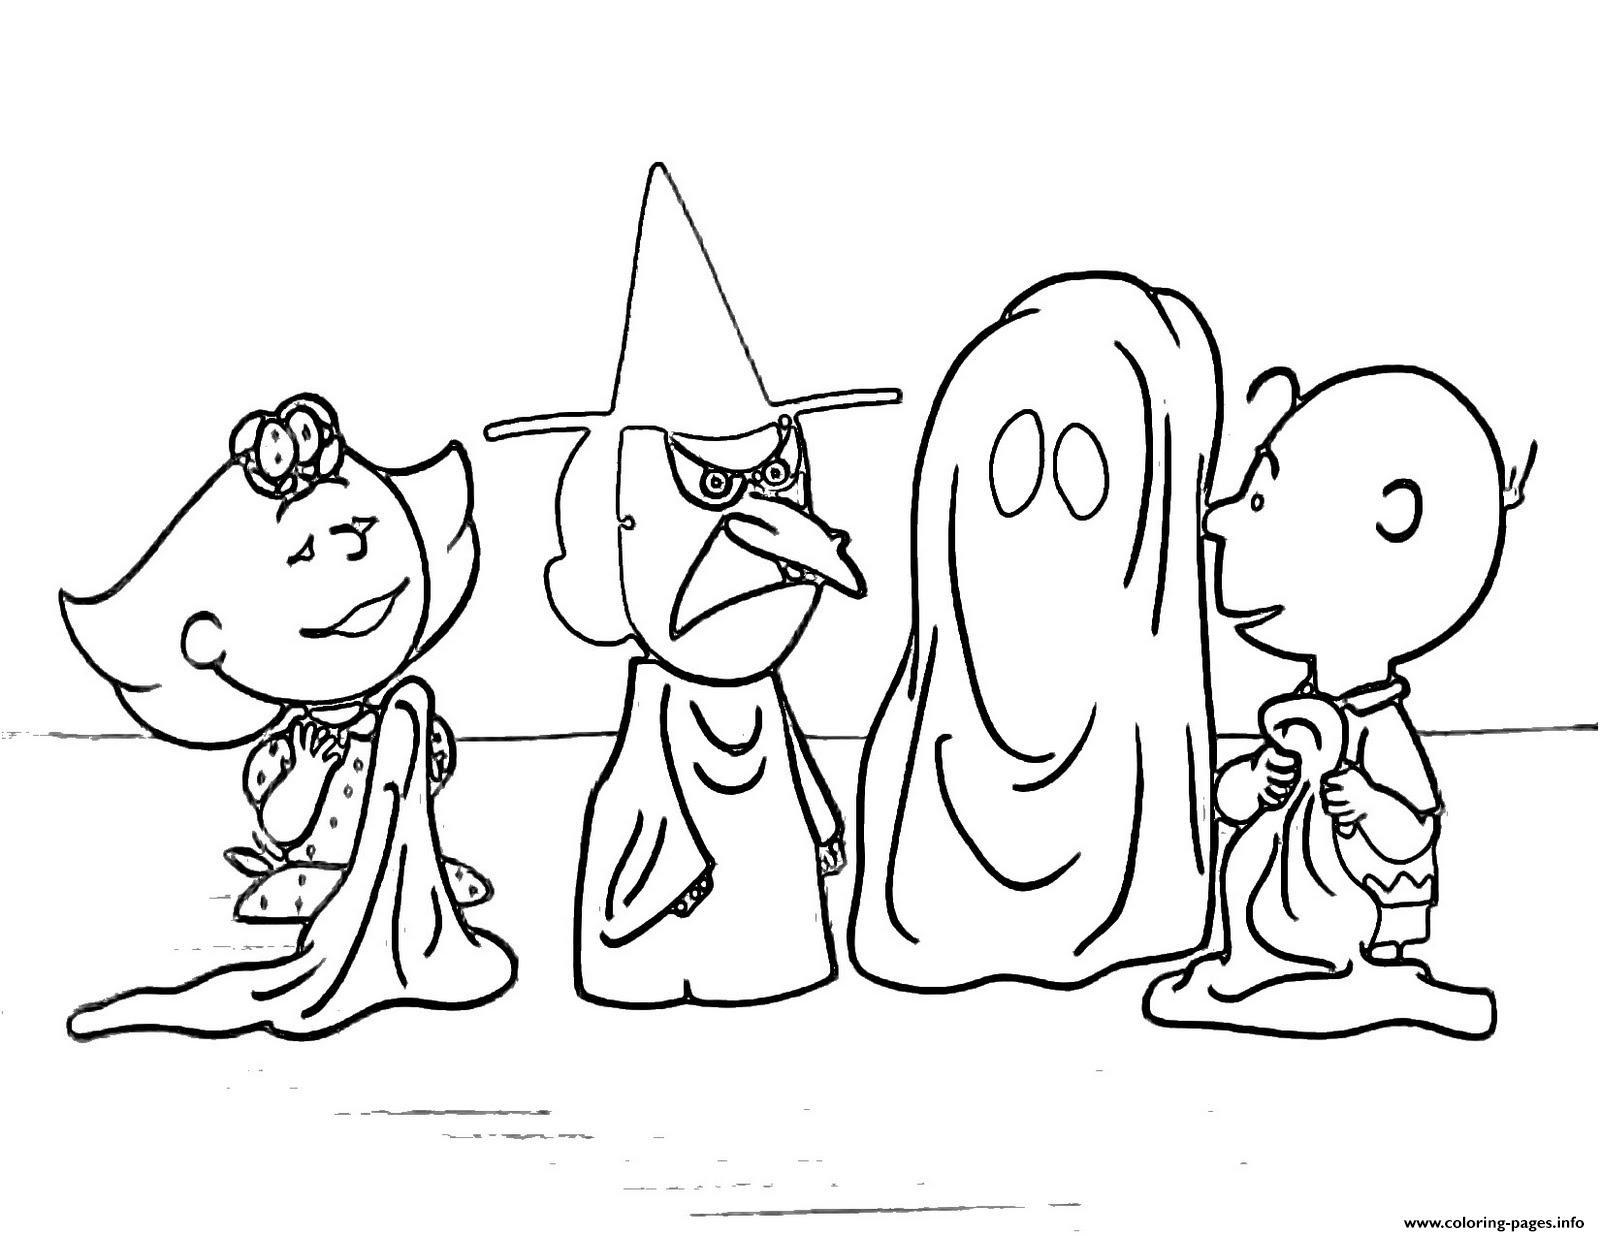 Charlie Brown Halloween S For Kidsc4D7 Coloring Pages Printable - Free Printable Charlie Brown Halloween Coloring Pages